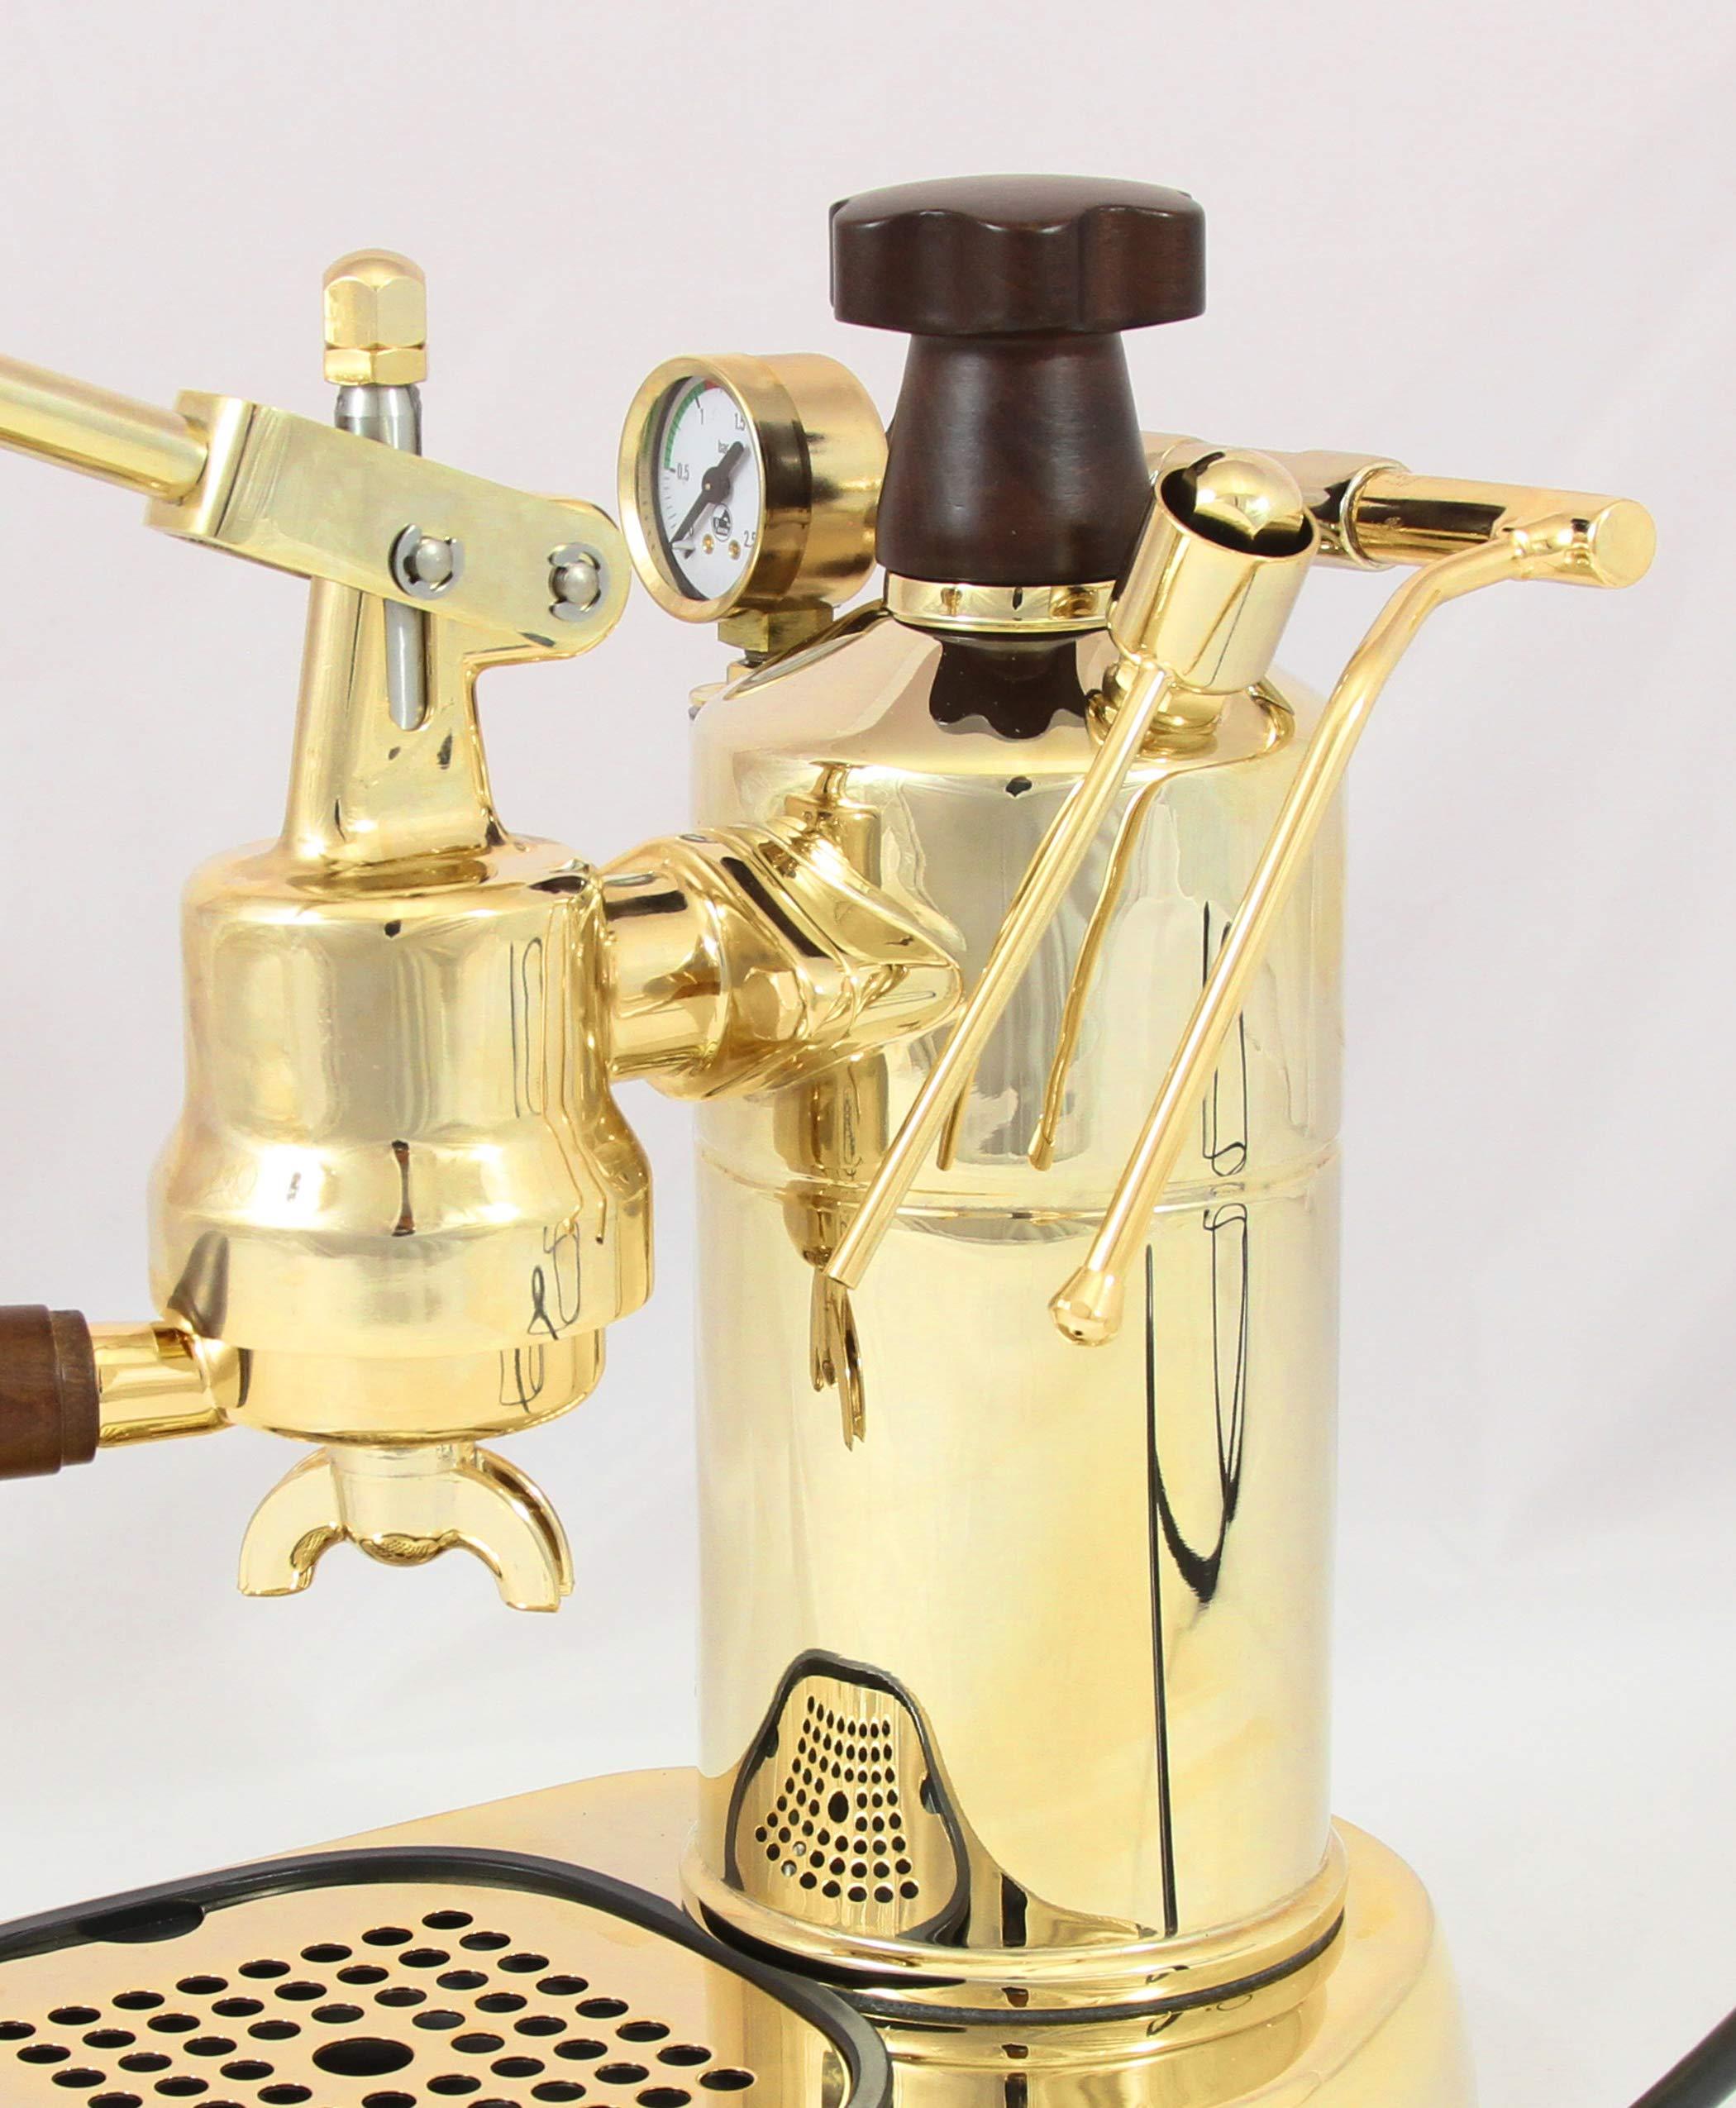 La Pavoni PPG-16 Professional 16-Cup Espresso Machine, Brass by La Pavoni